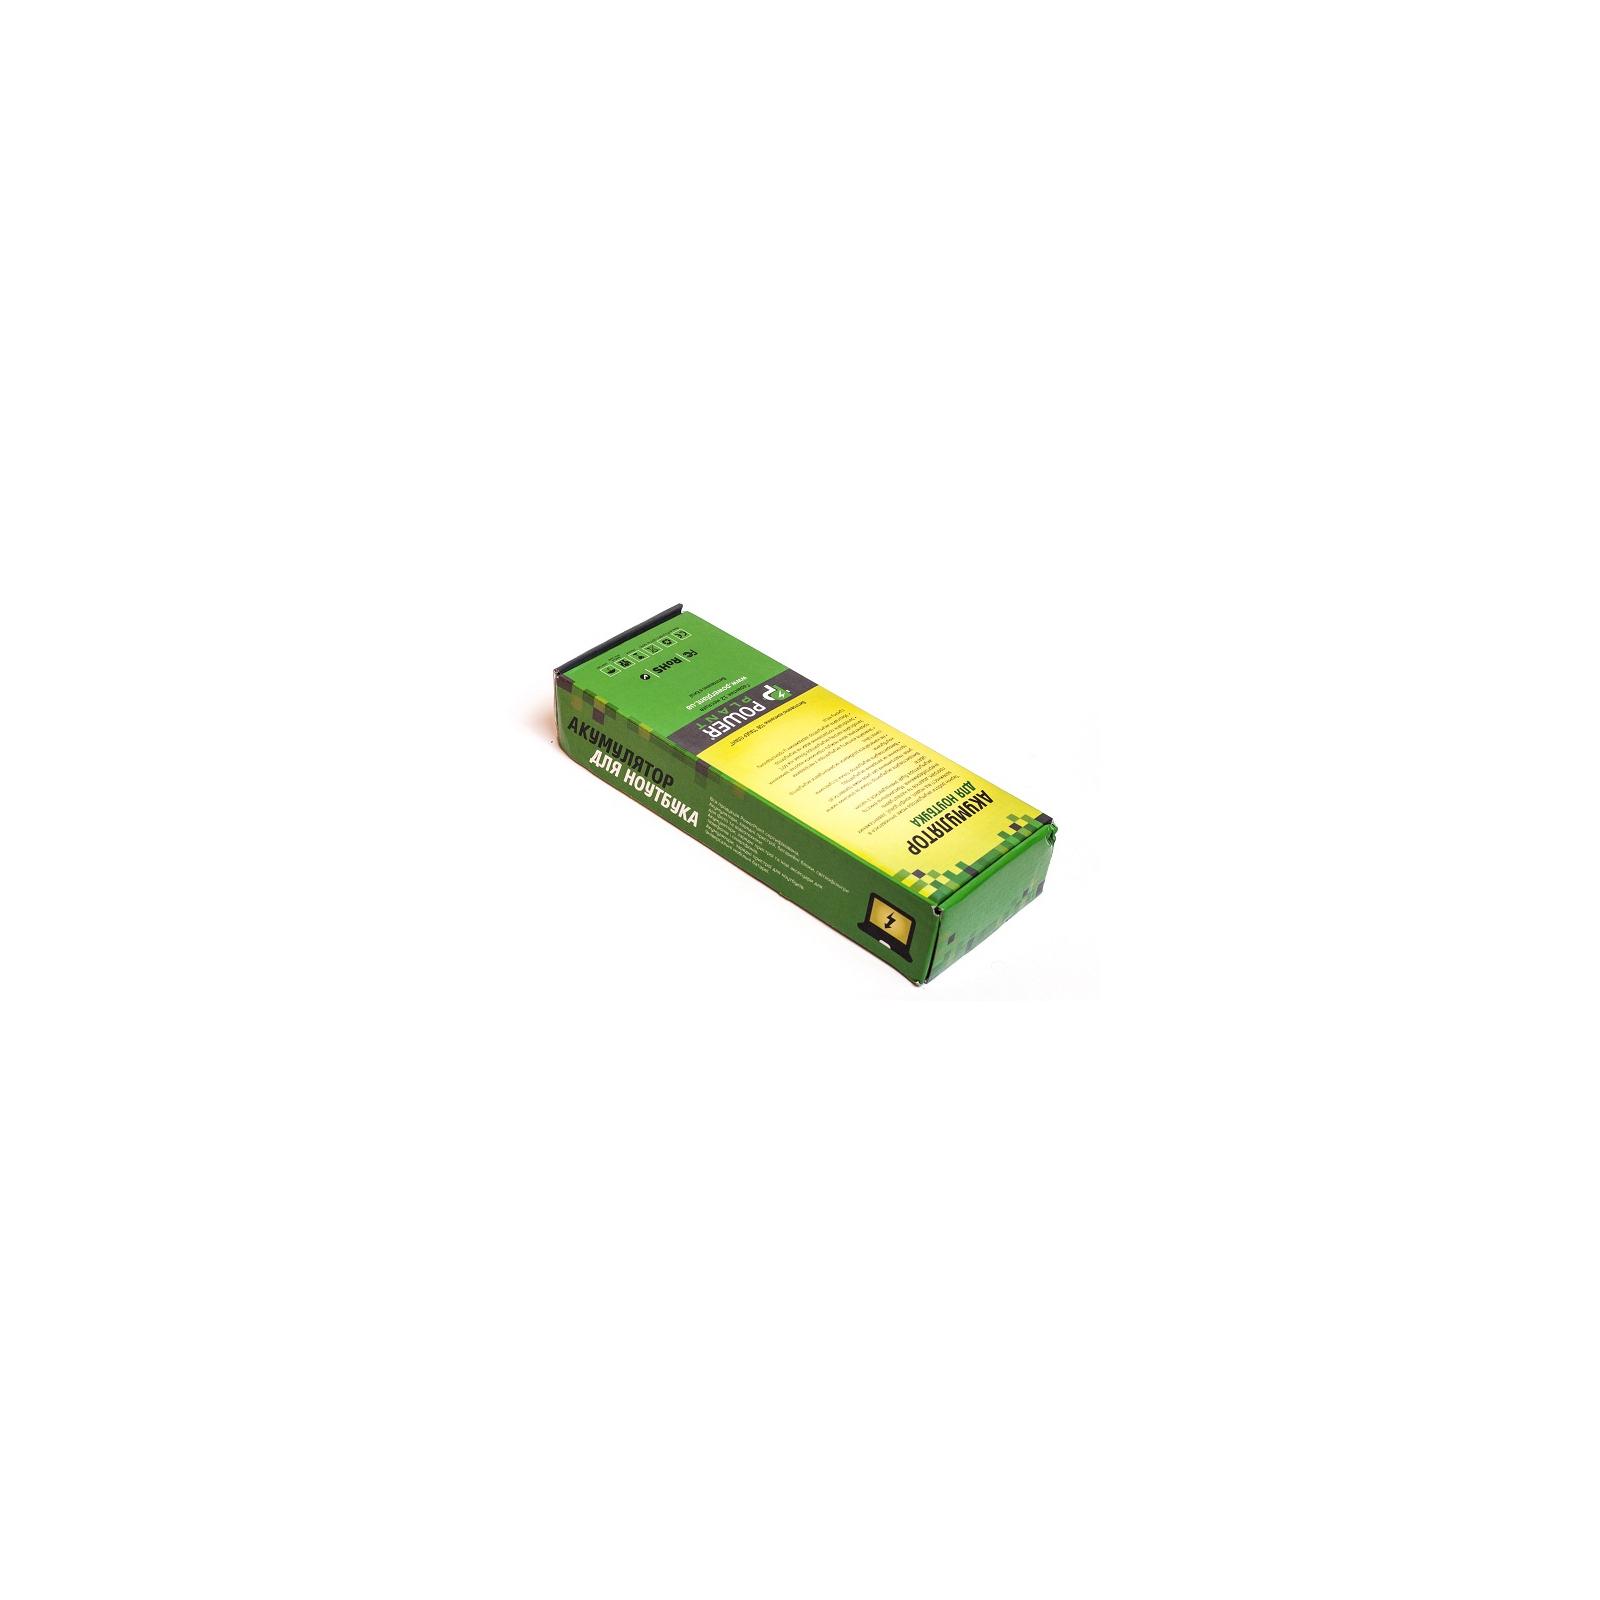 Аккумулятор для ноутбука HP 6730s (HSTNN-IB51, H6720 3S2P) 10.8V 5200mAh PowerPlant (NB00000017) изображение 2